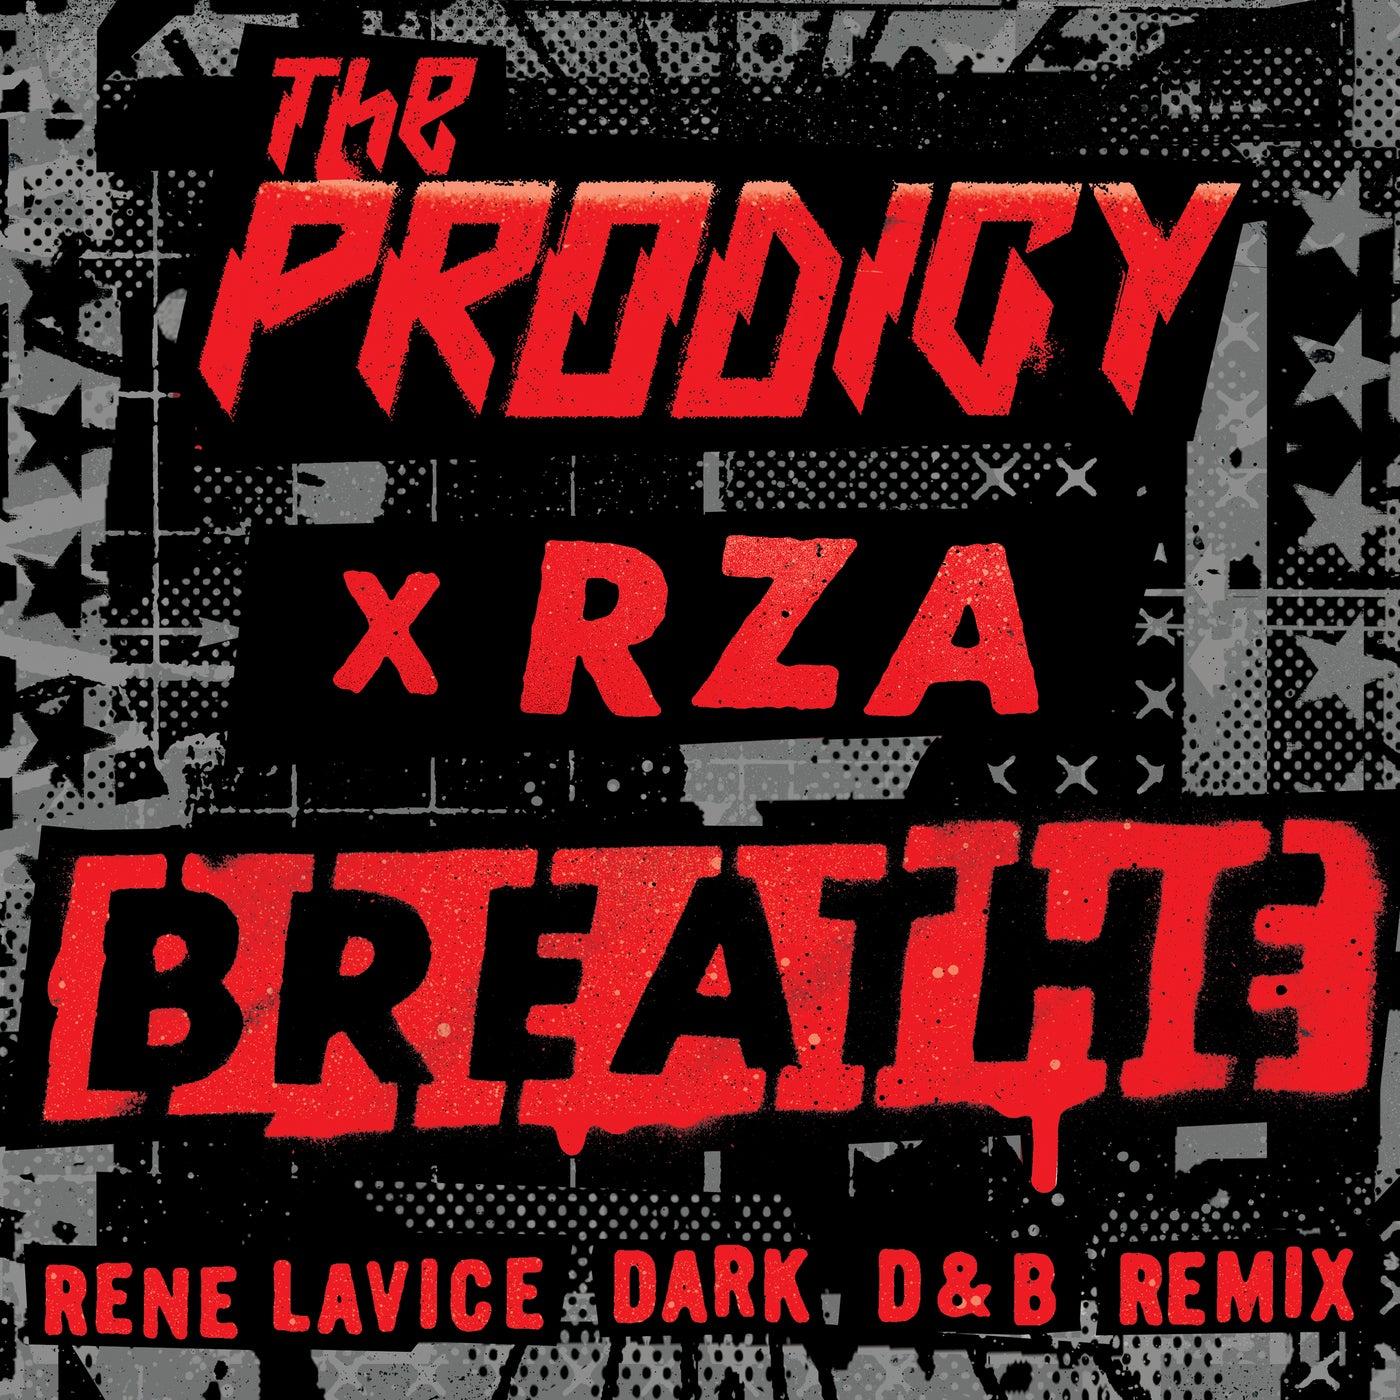 Breathe (feat. RZA) (Rene LaVice Dark D&B Remix)